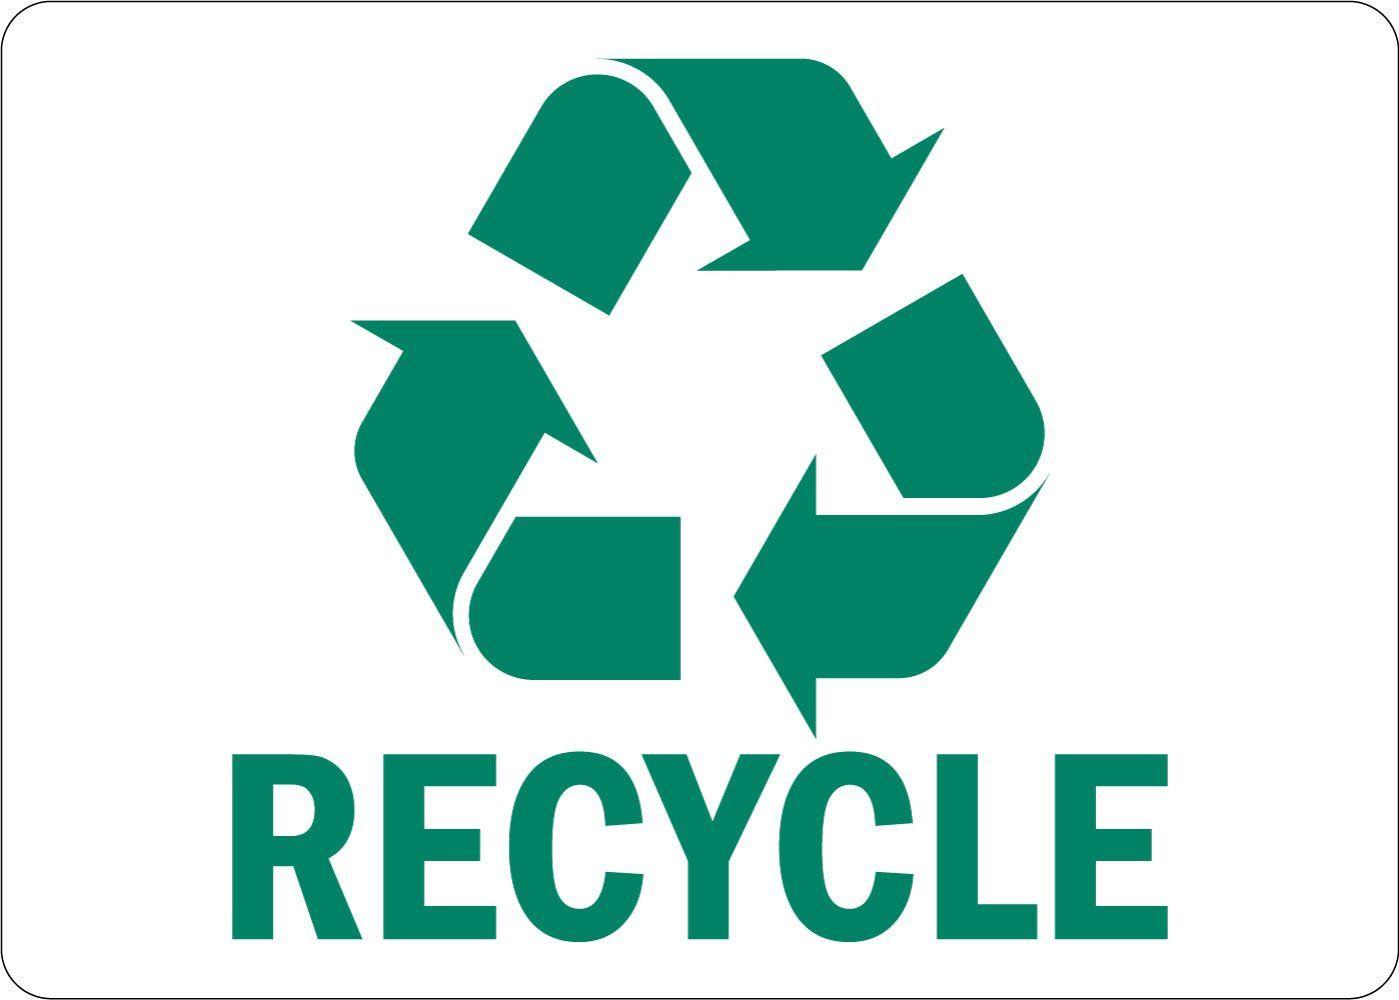 Lyle signs engineer grade reflective sheeting on aluminum trash grad parties buycottarizona Choice Image